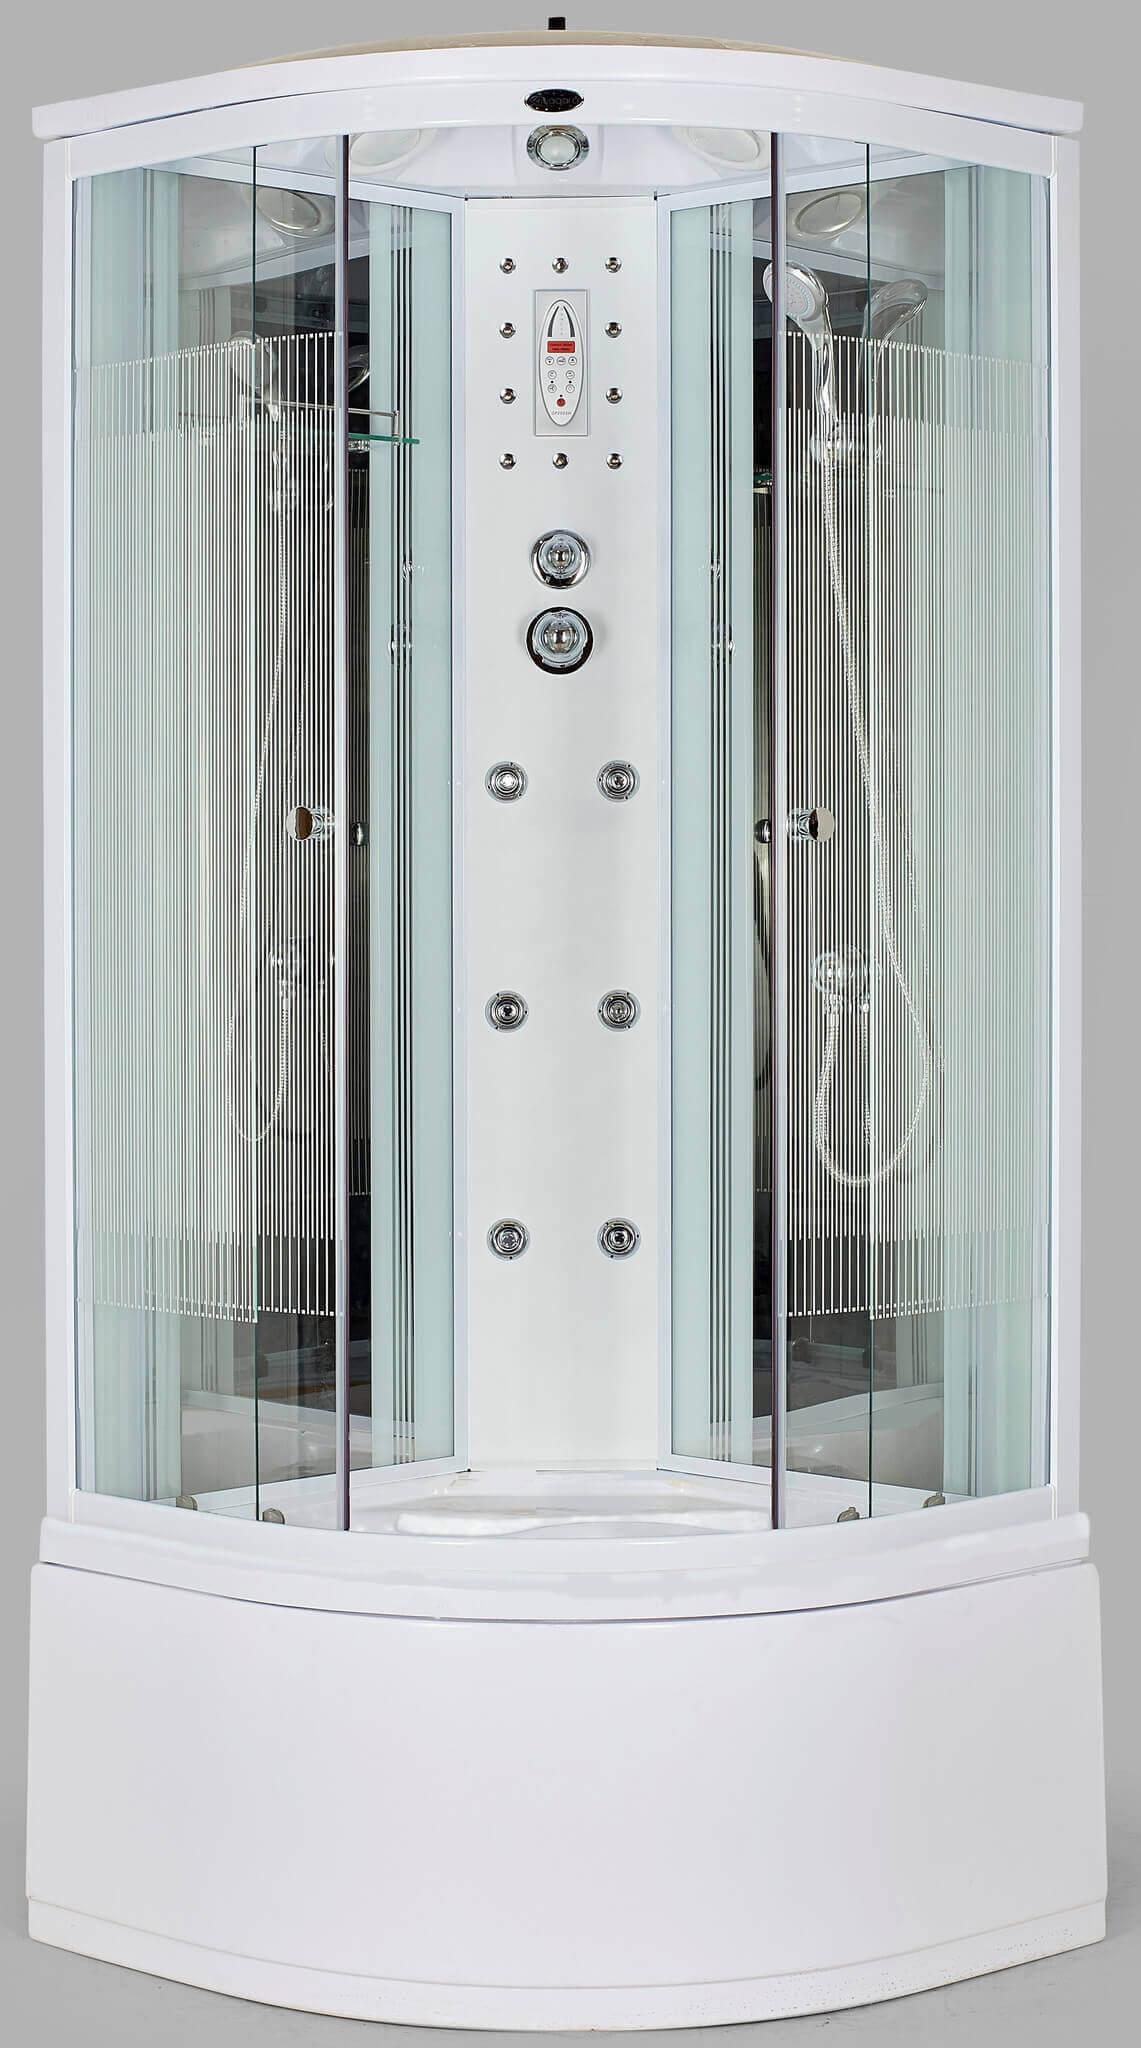 Душевая кабина Niagara (Ниагара) NG-708 угловая, с глубоким поддоном (высокая), стеклянная, размер 90х90 см